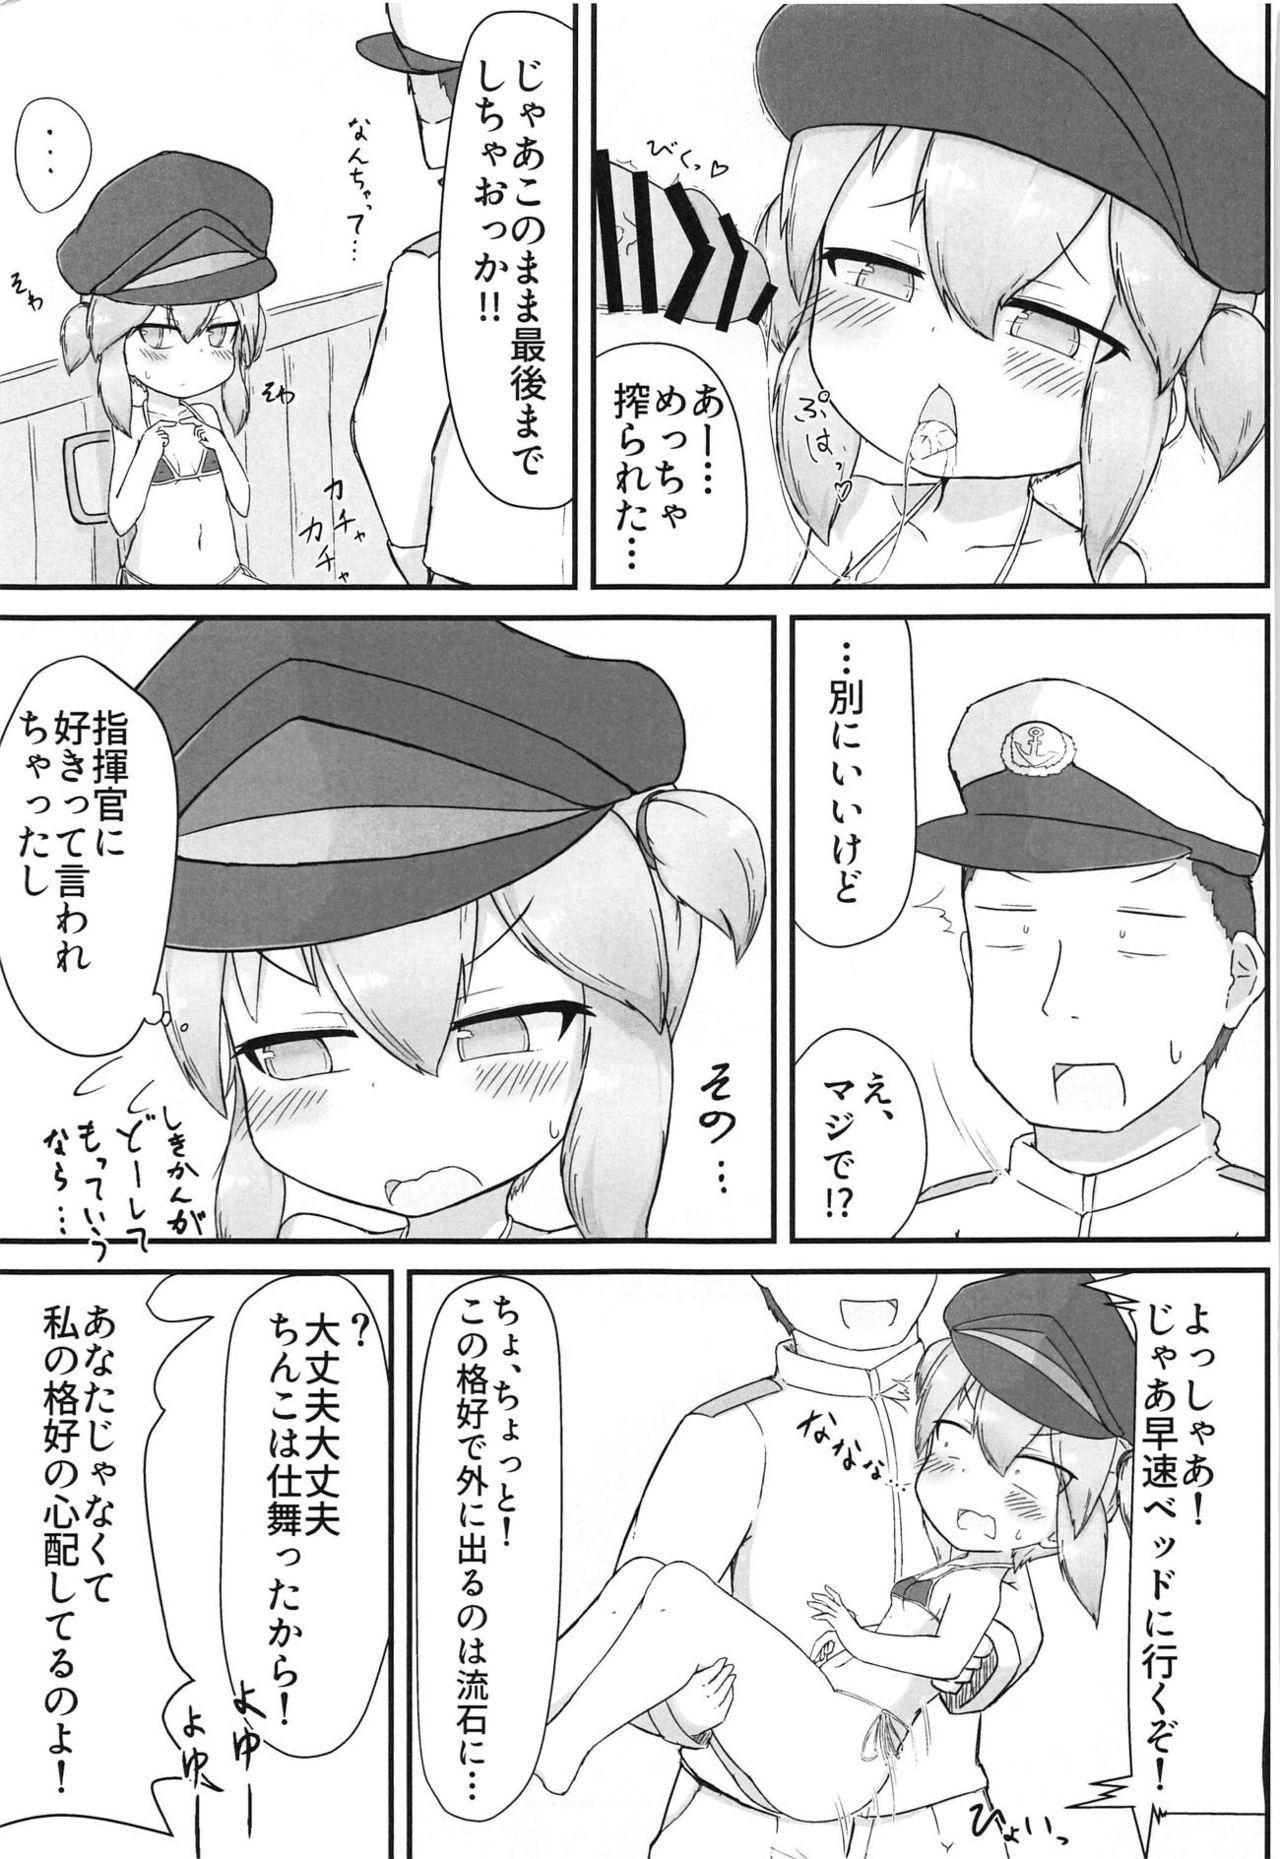 Wil-chan to Ecchi Suru Hon 9